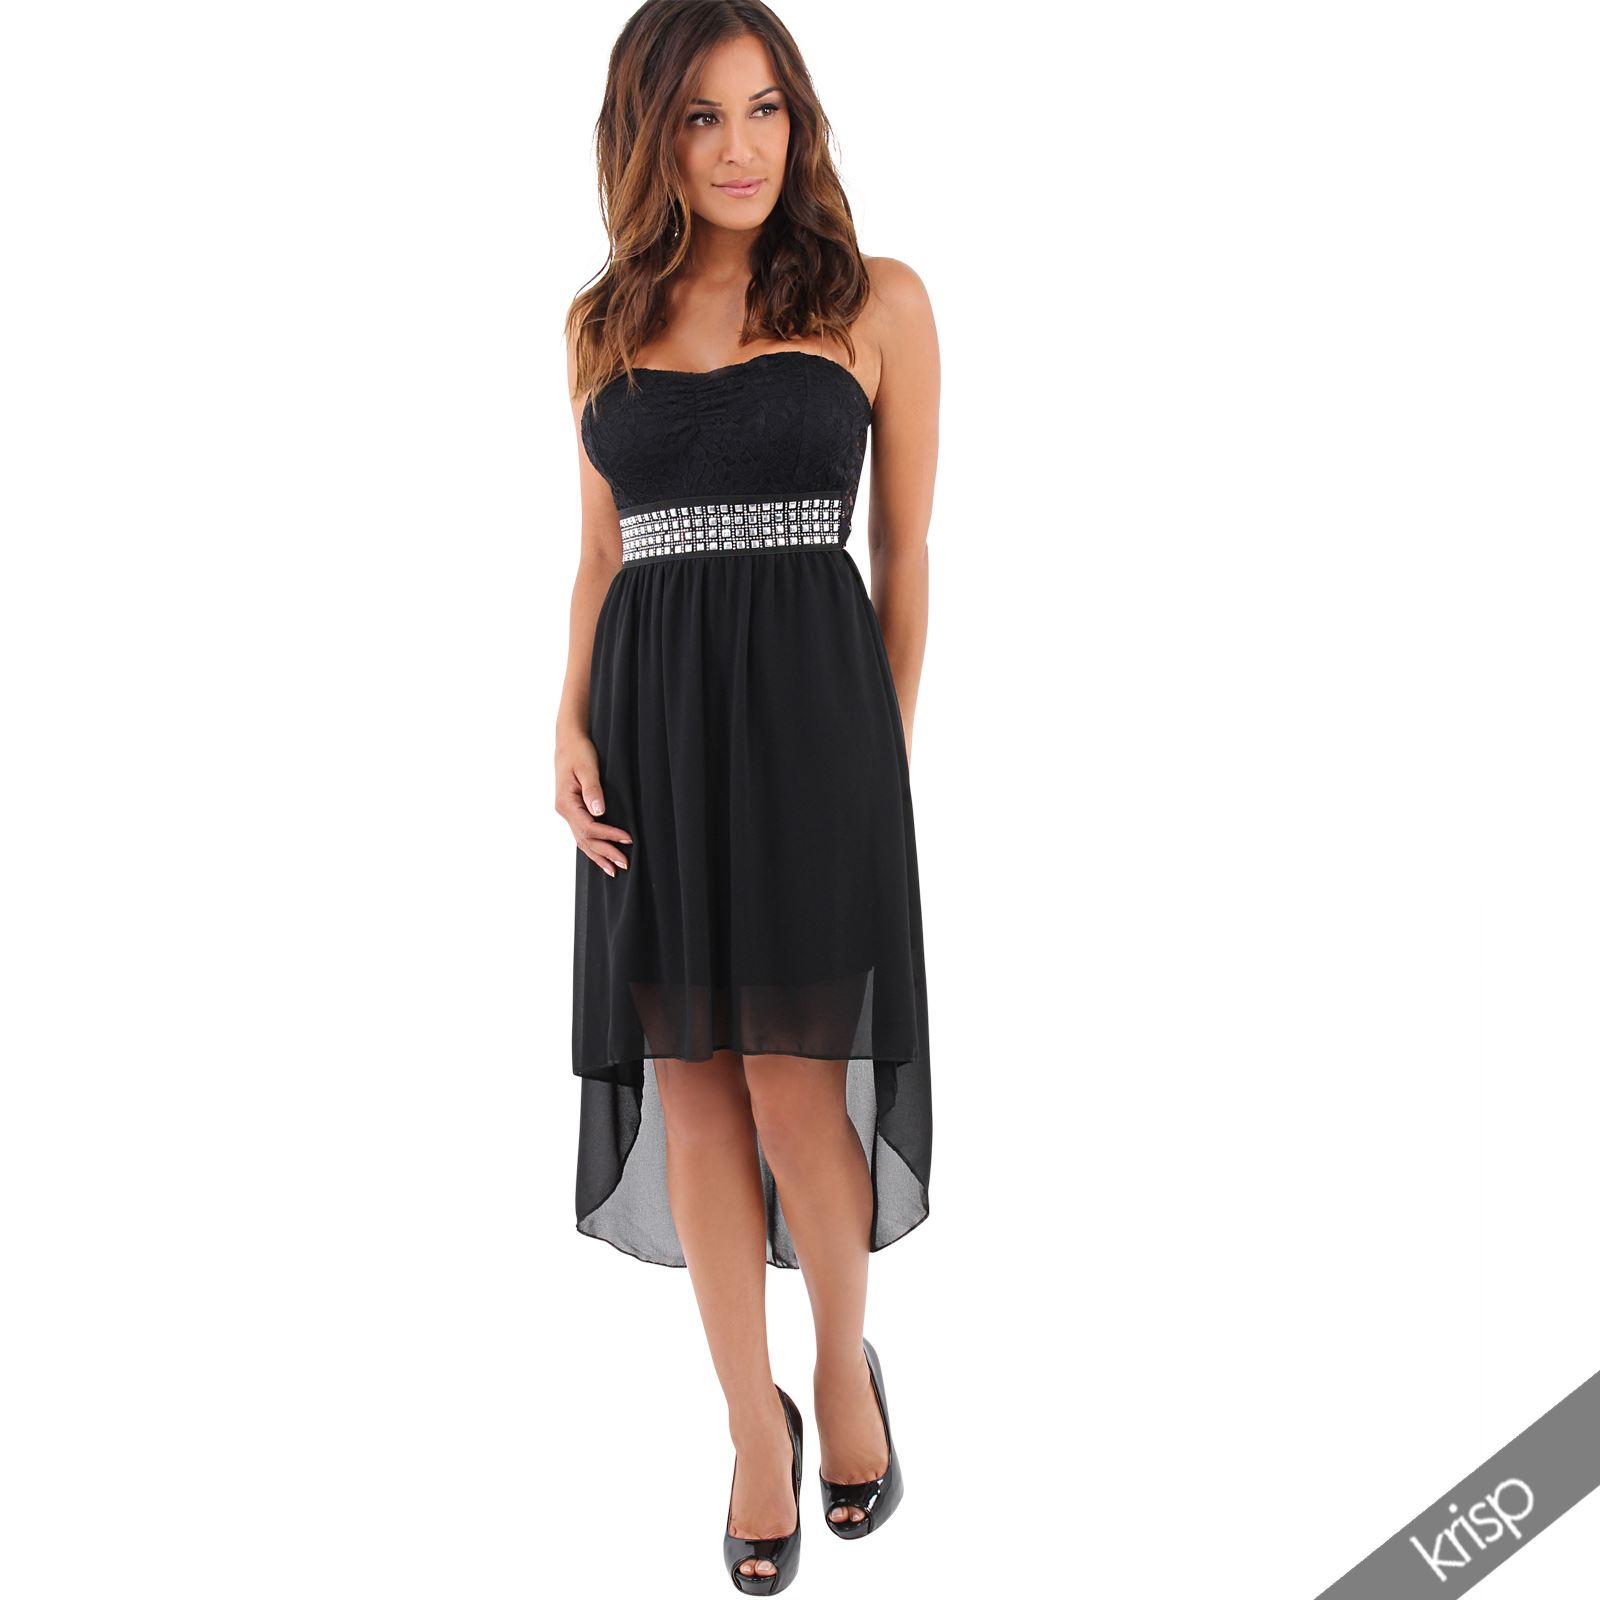 Womens Lace Boob Tube Fishtail Mini Dress Chiffon Skirt ...